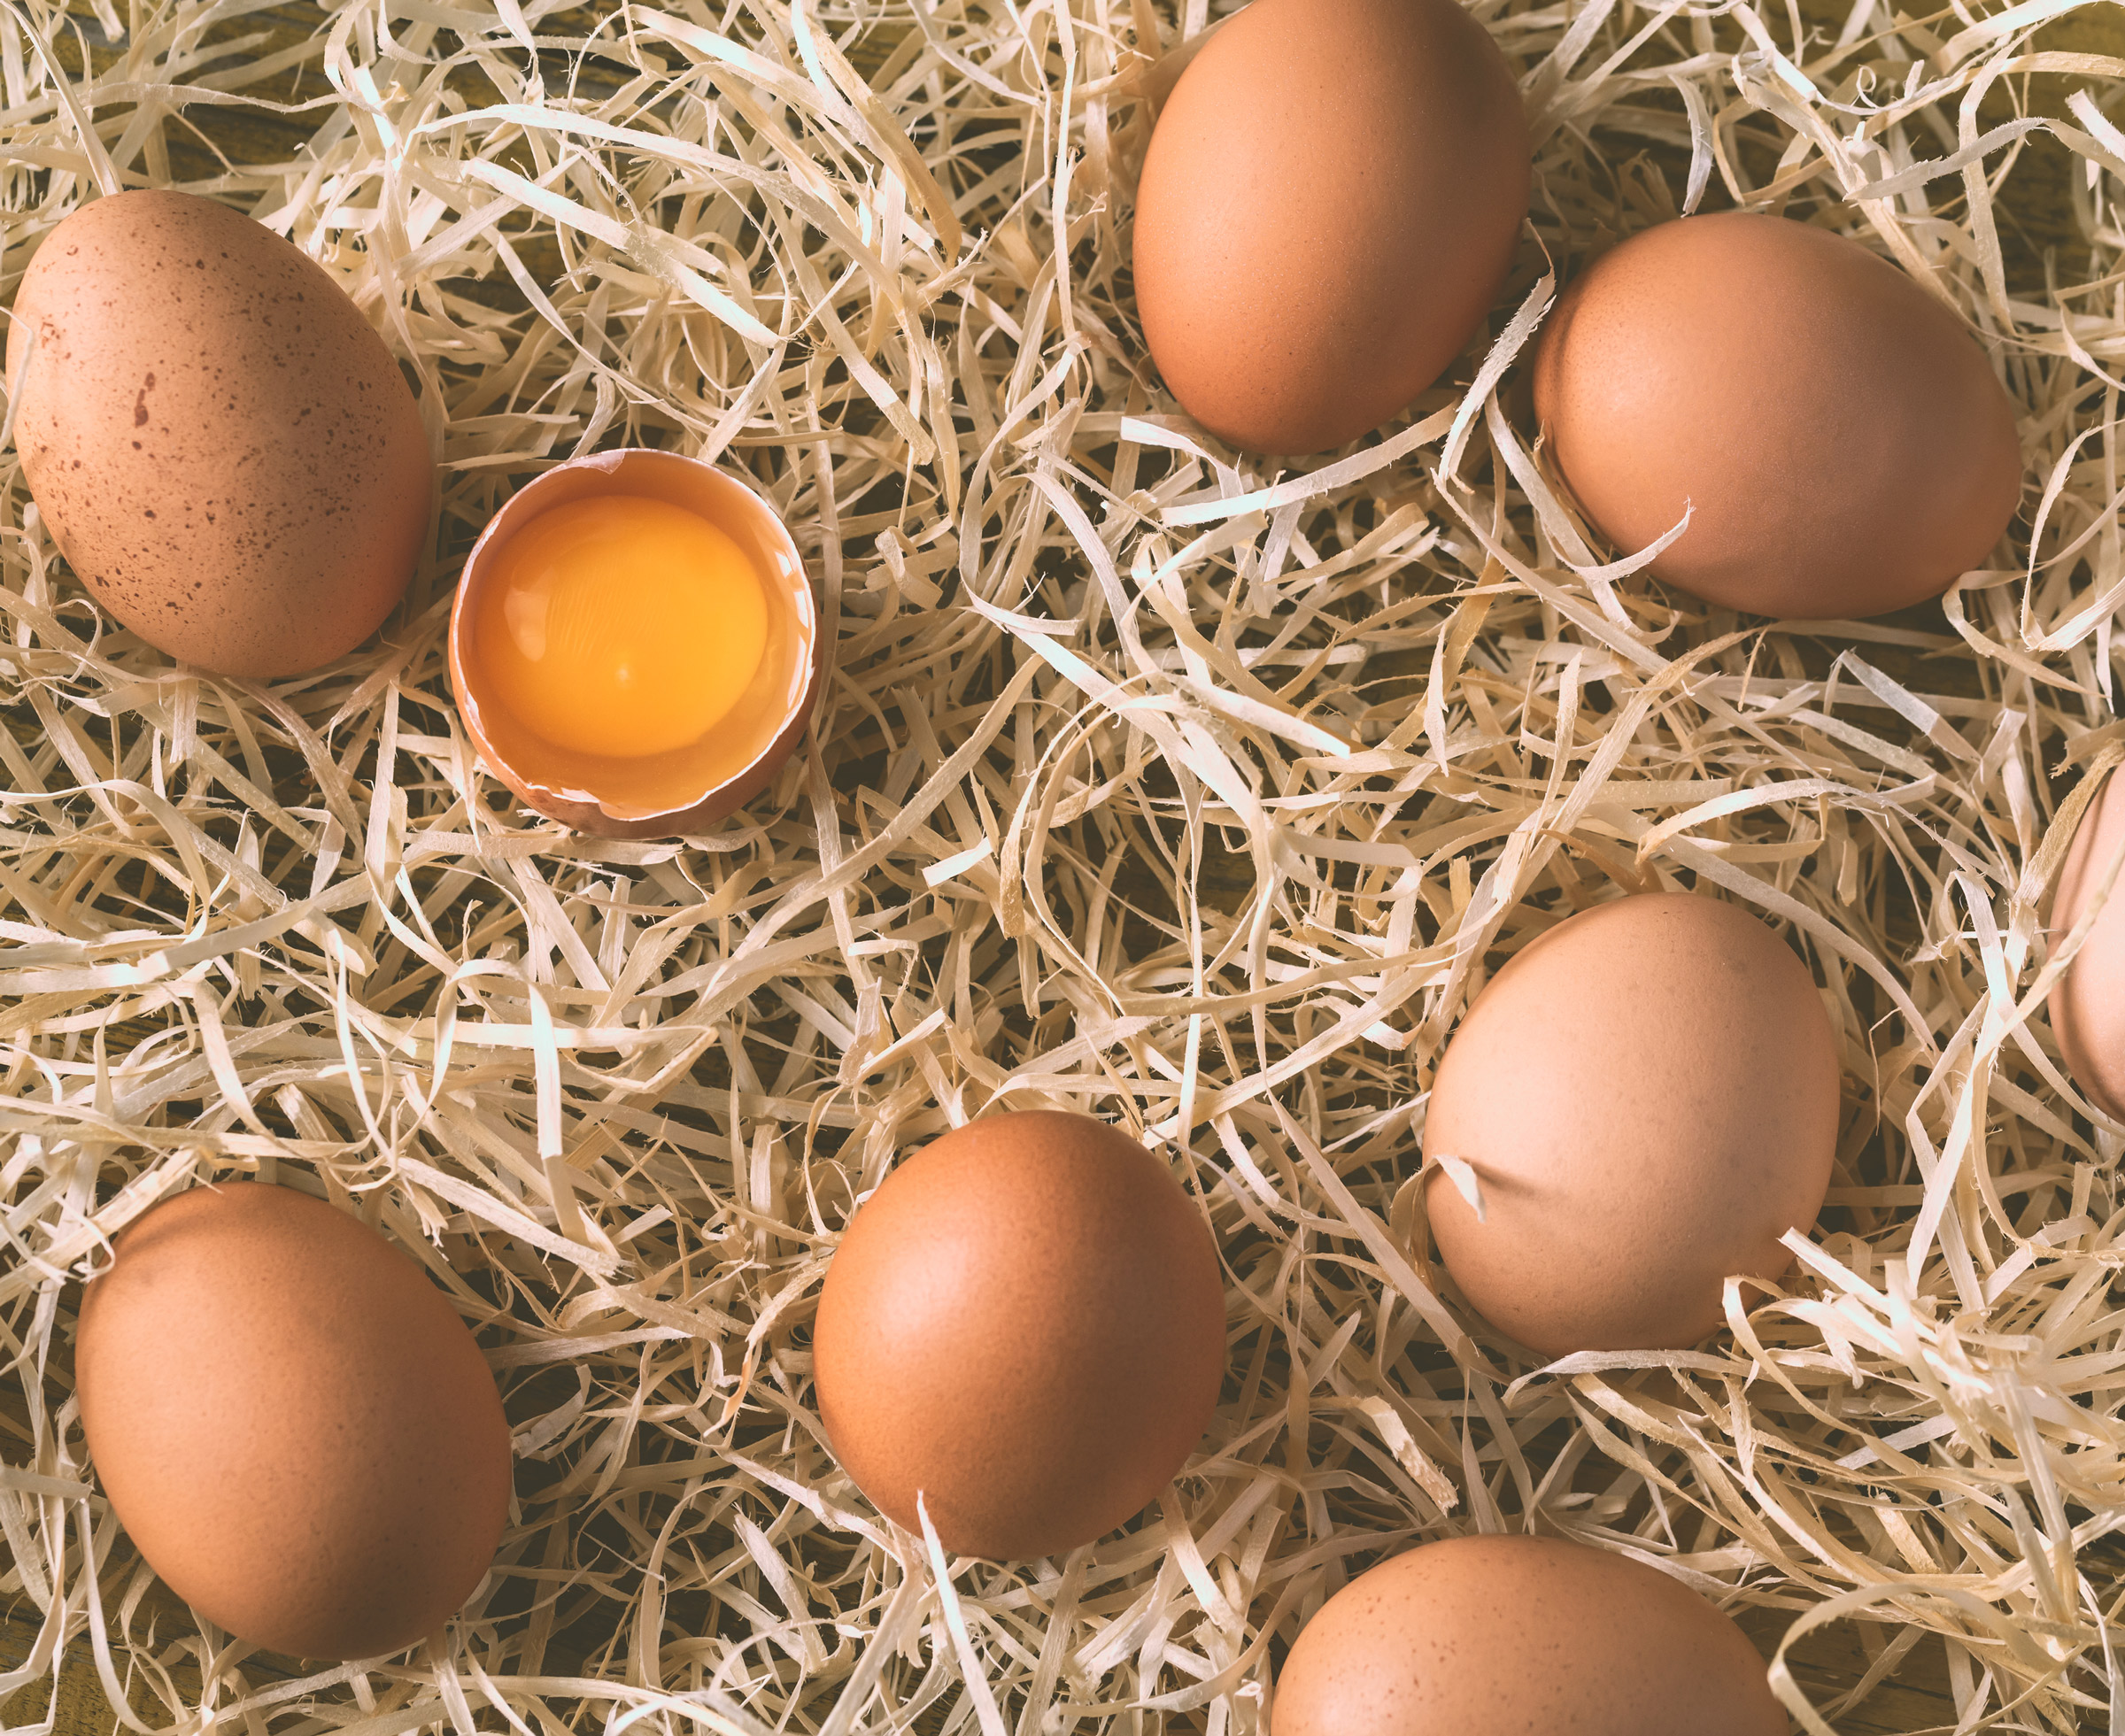 Jajca domačih kokoši